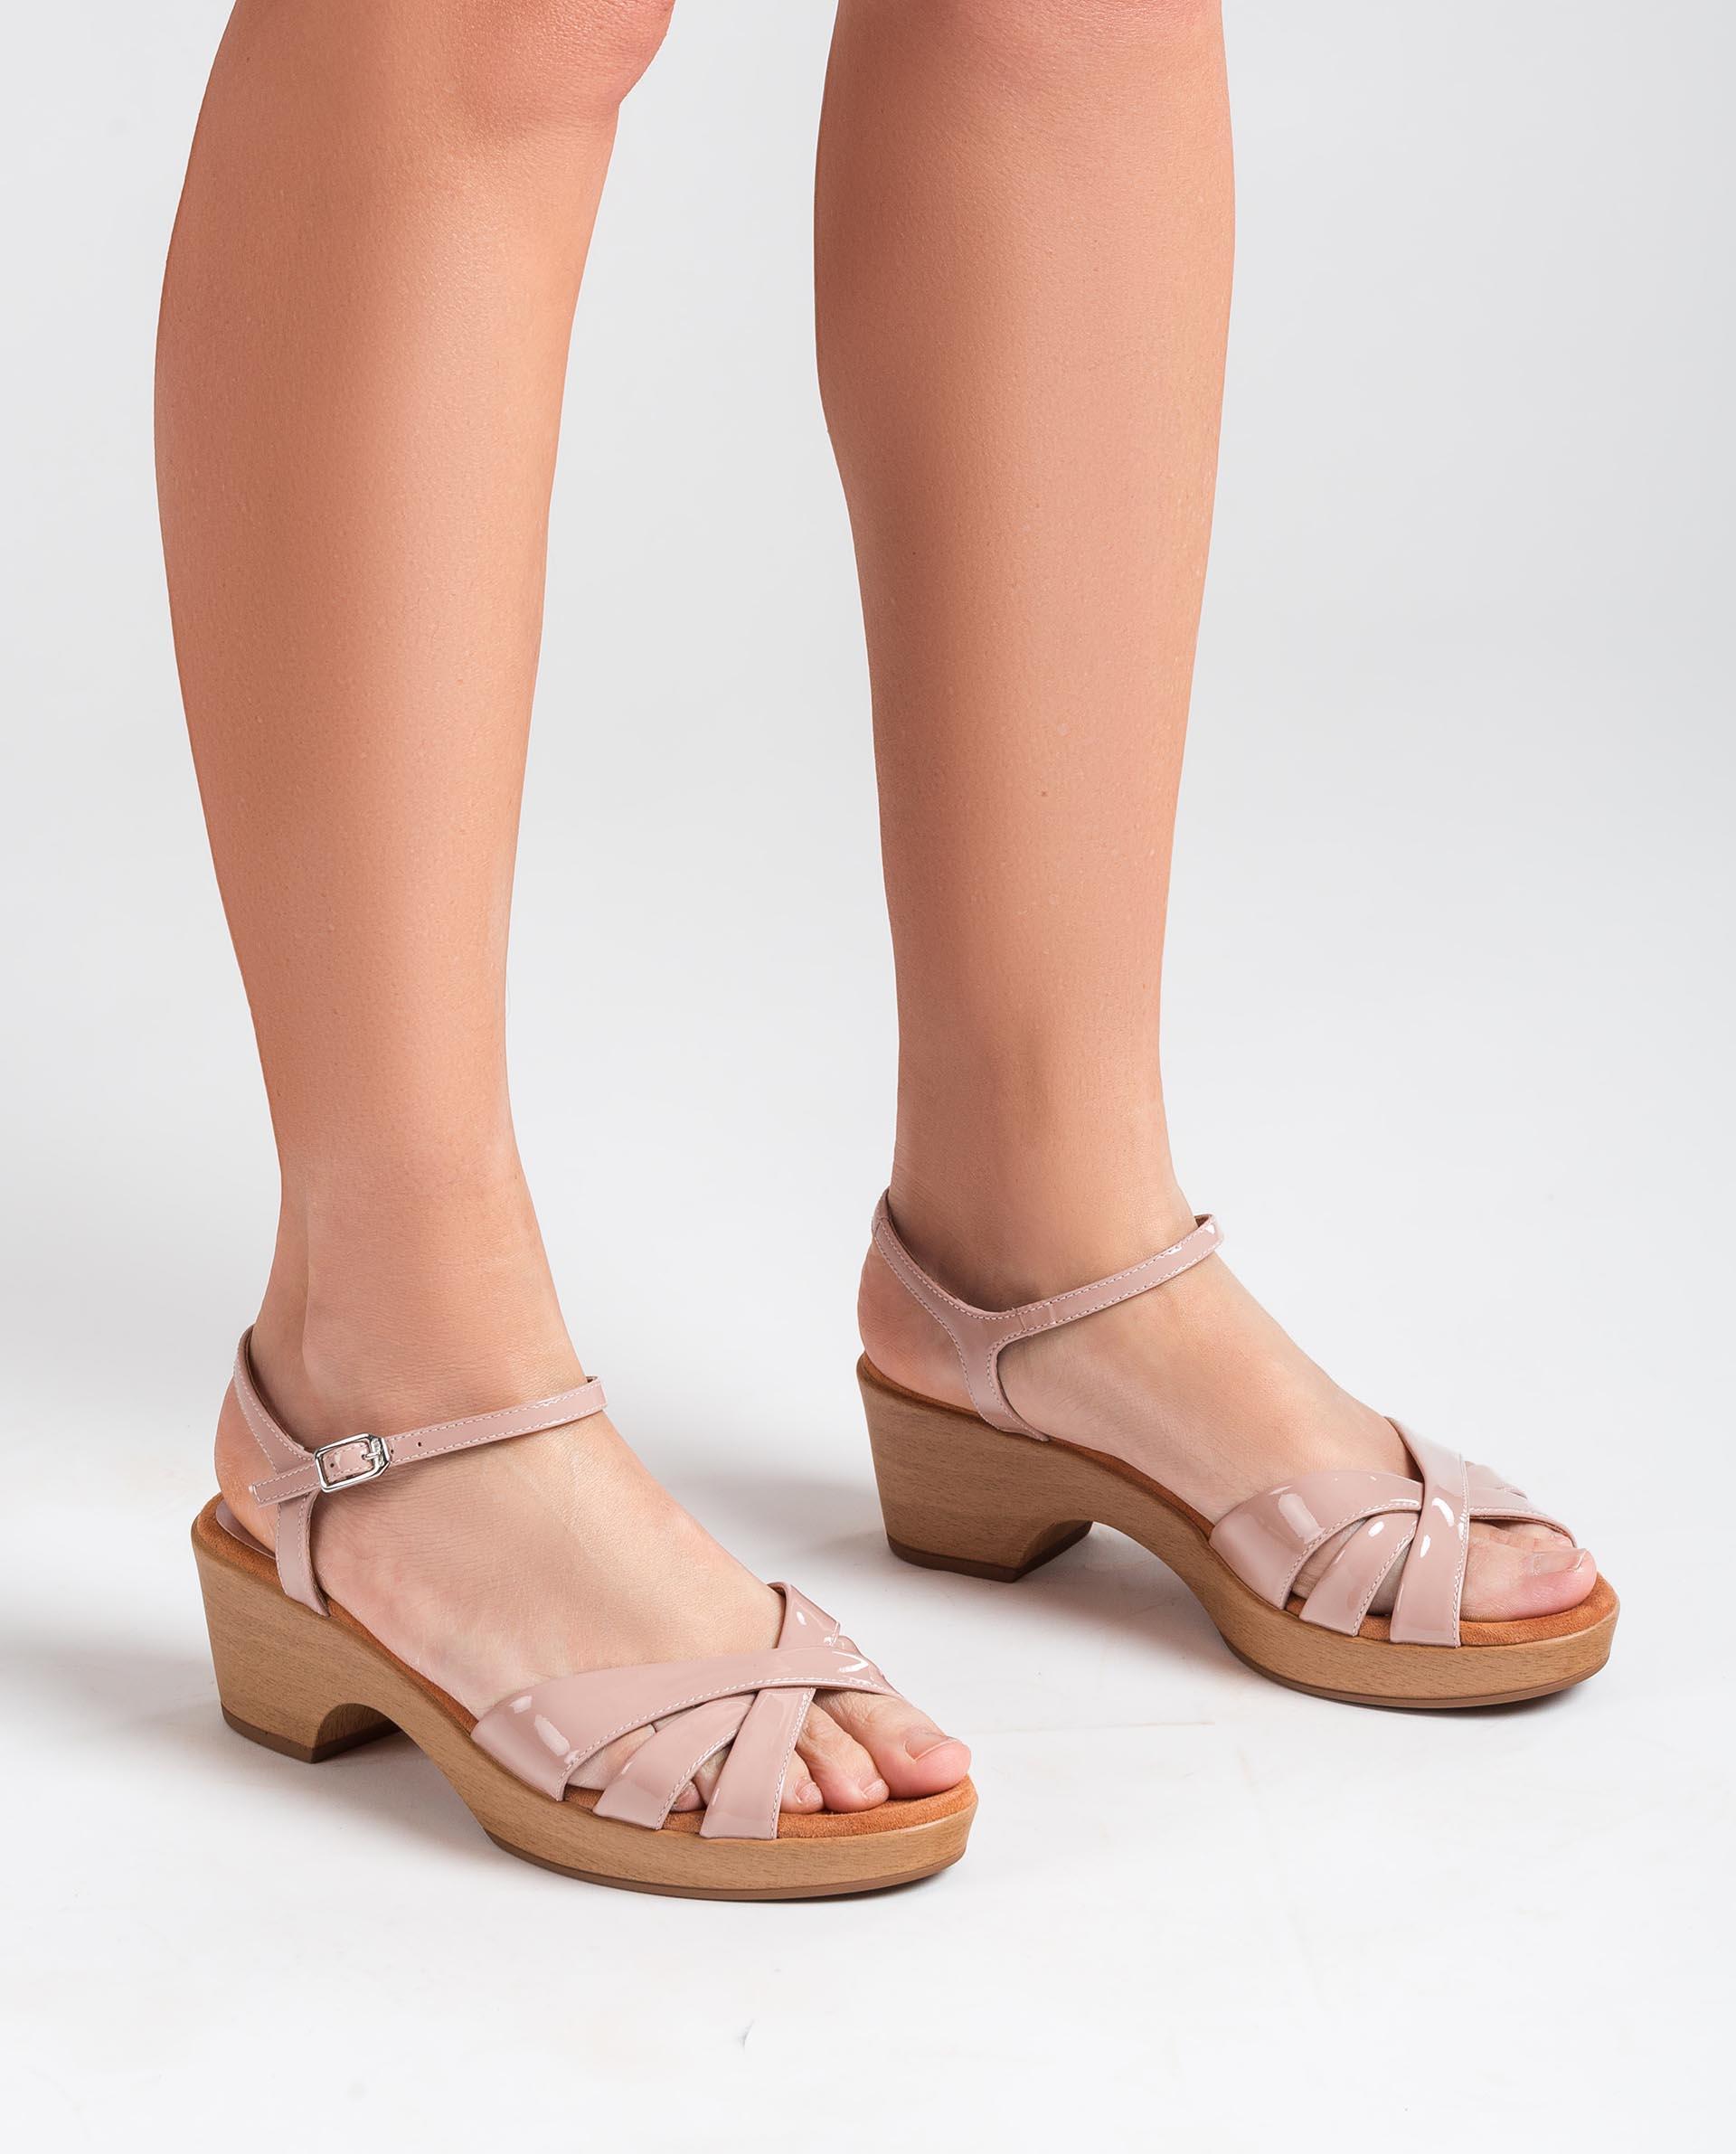 UNISA Patent leather strappy sandals INQUI_PA 2